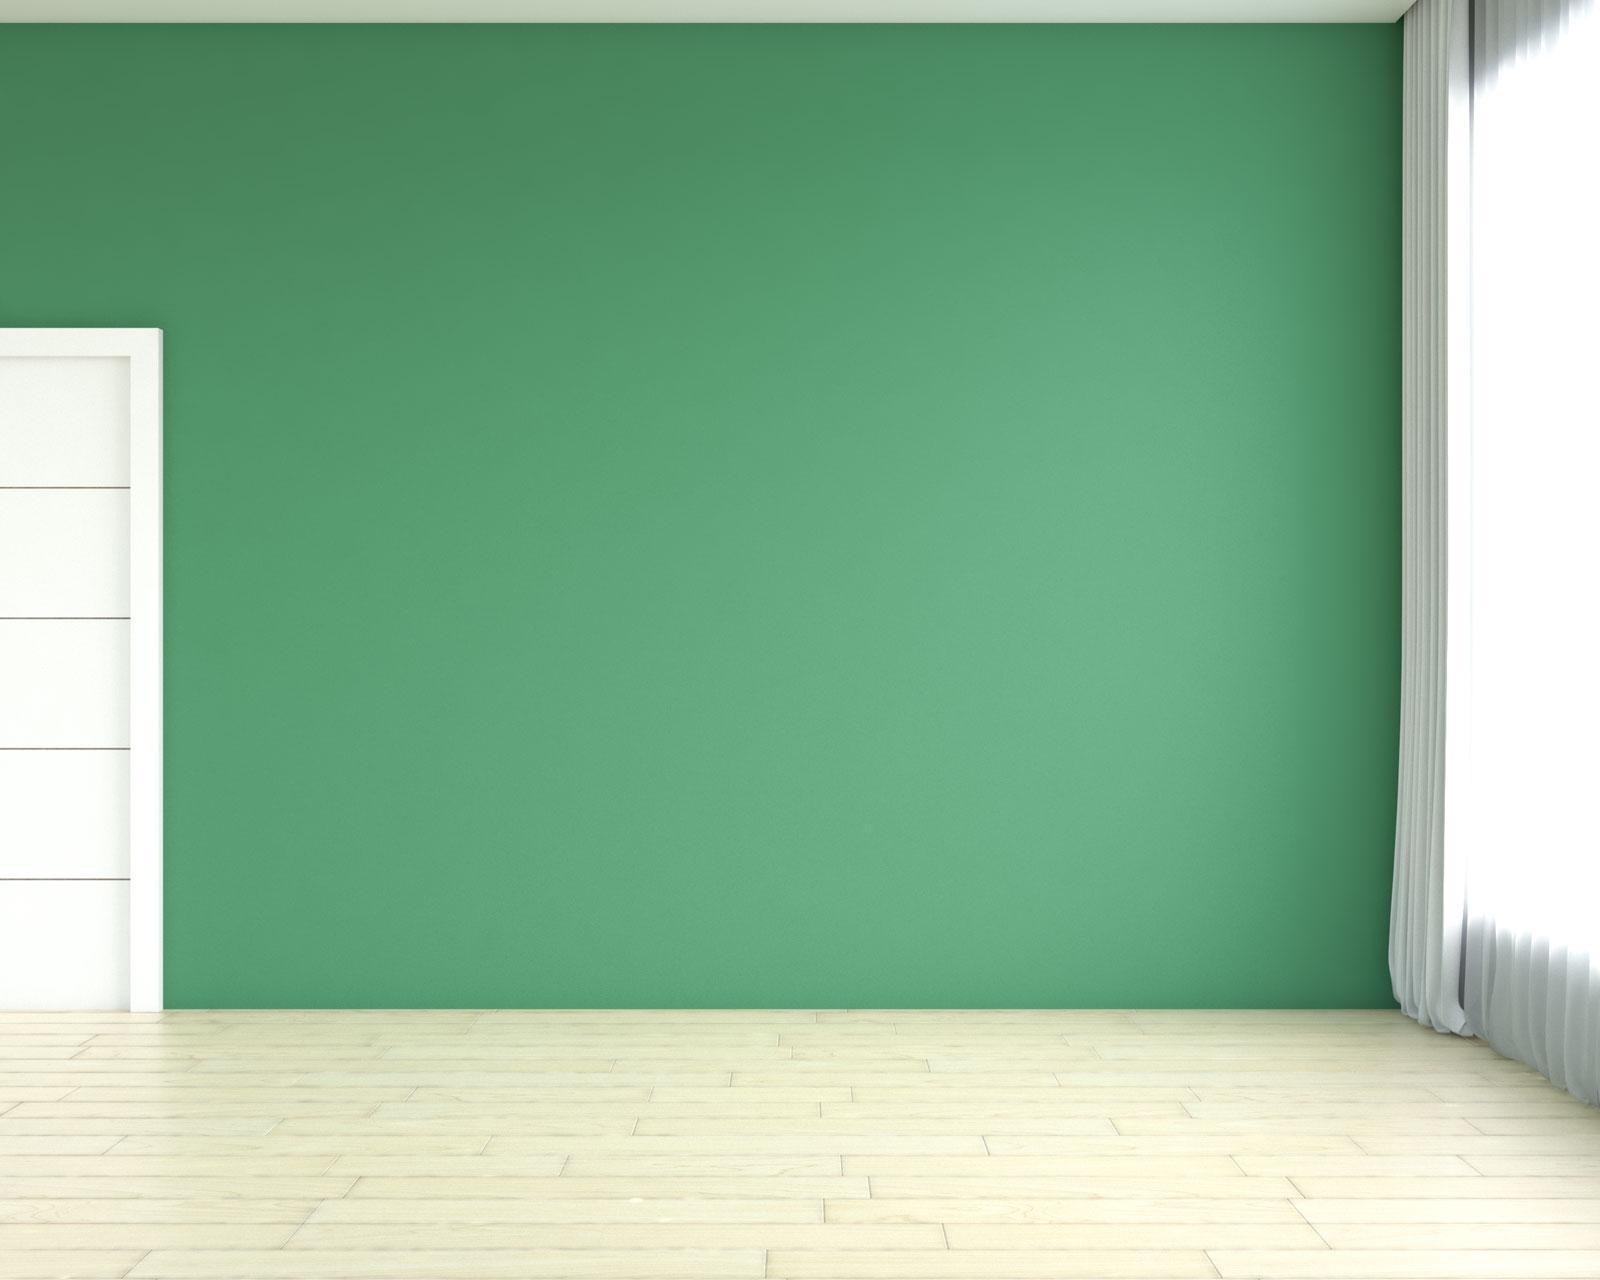 Bamboo flooring with green walls